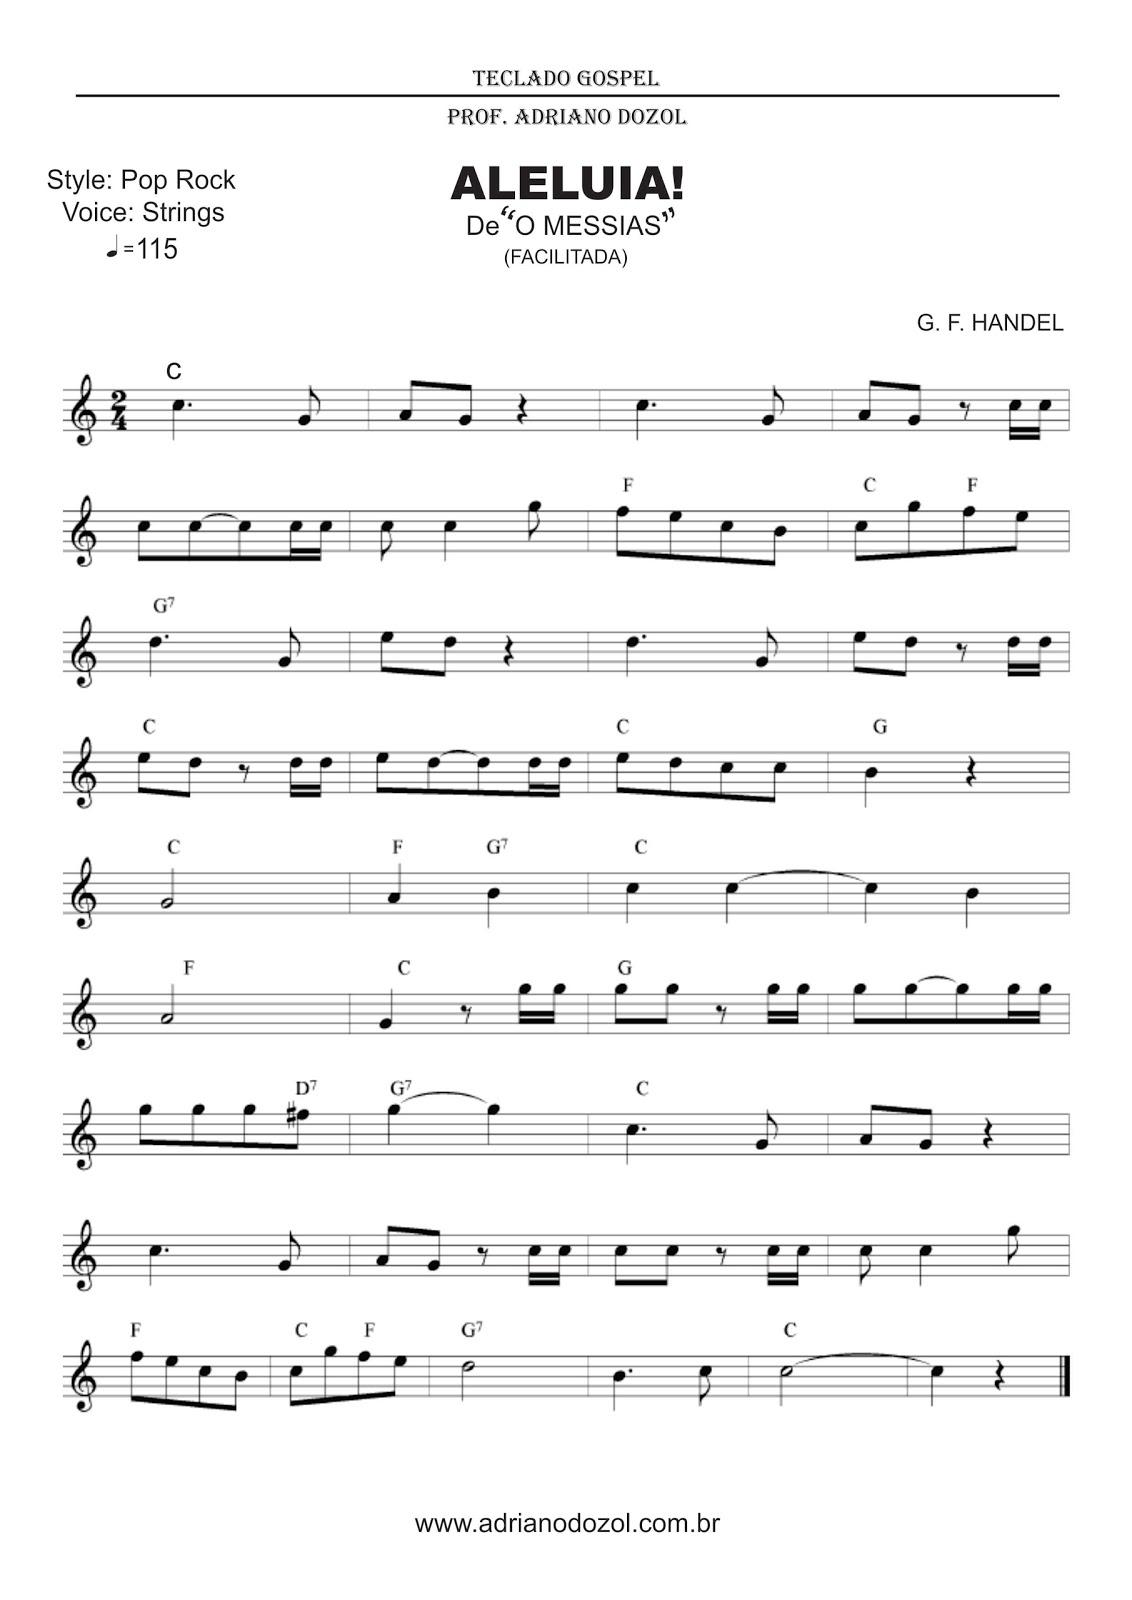 Fabuloso Adriano Dozol - Dicas, Partituras Grátis e Vídeos - Teclado  MF51